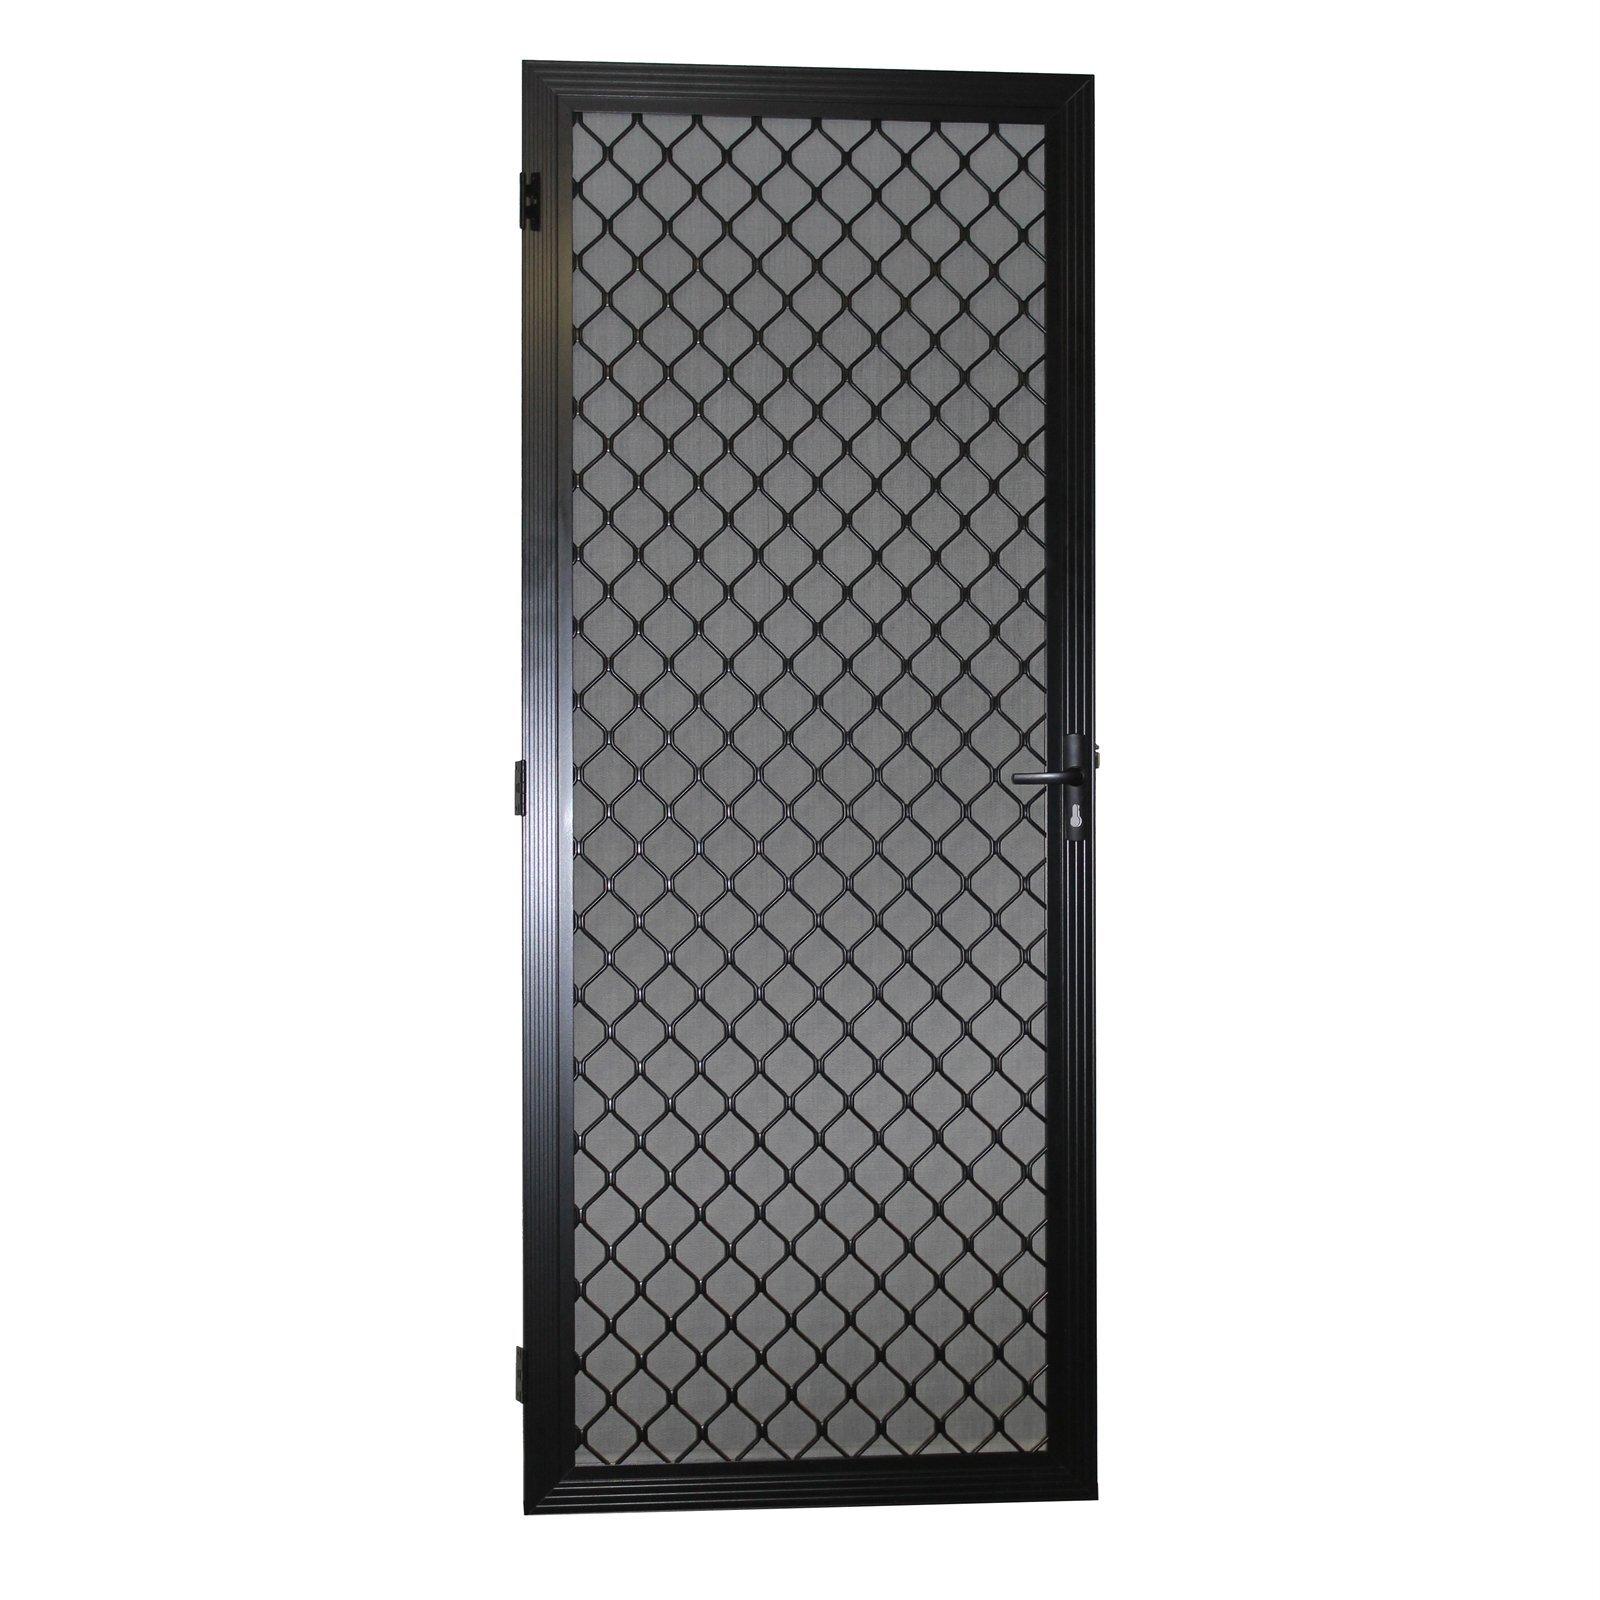 Protector Aluminium 813 x 2032mm Black Metric Fixed Barrier Door